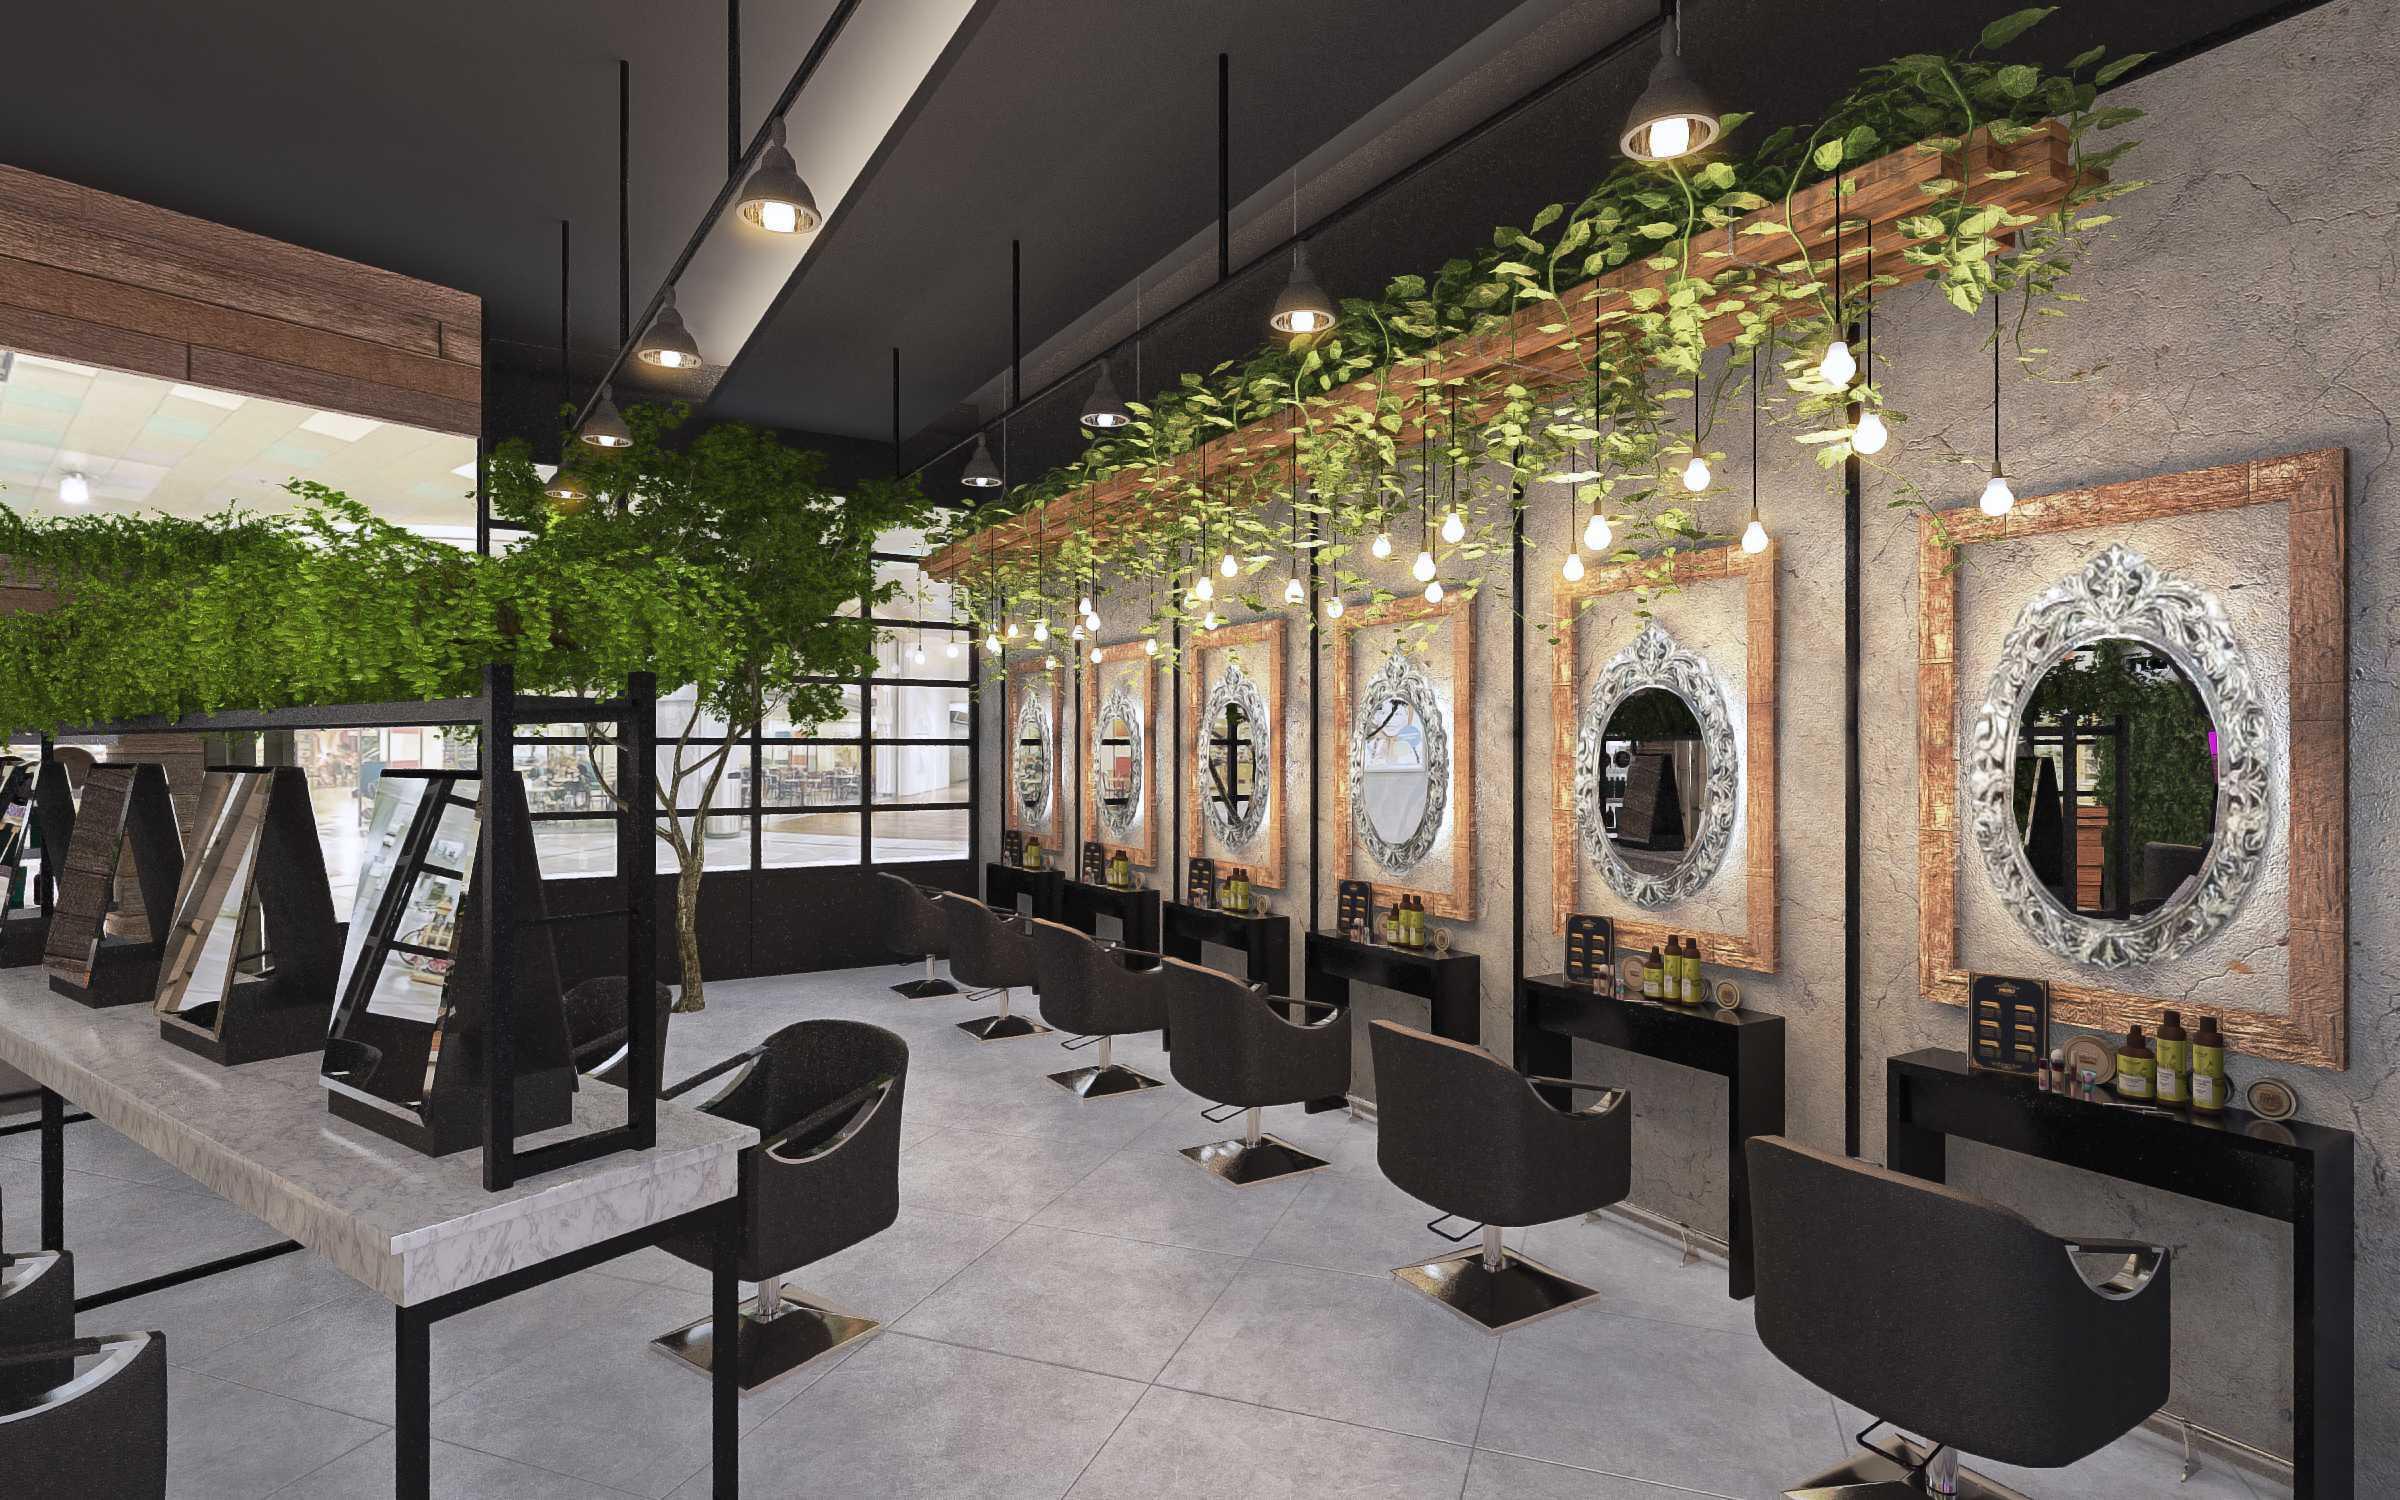 Ruang Komunal The Hair Dept Karawaci, Kota Tangerang, Banten, Indonesia Karawaci, Kota Tangerang, Banten, Indonesia Interior View Salon   52135